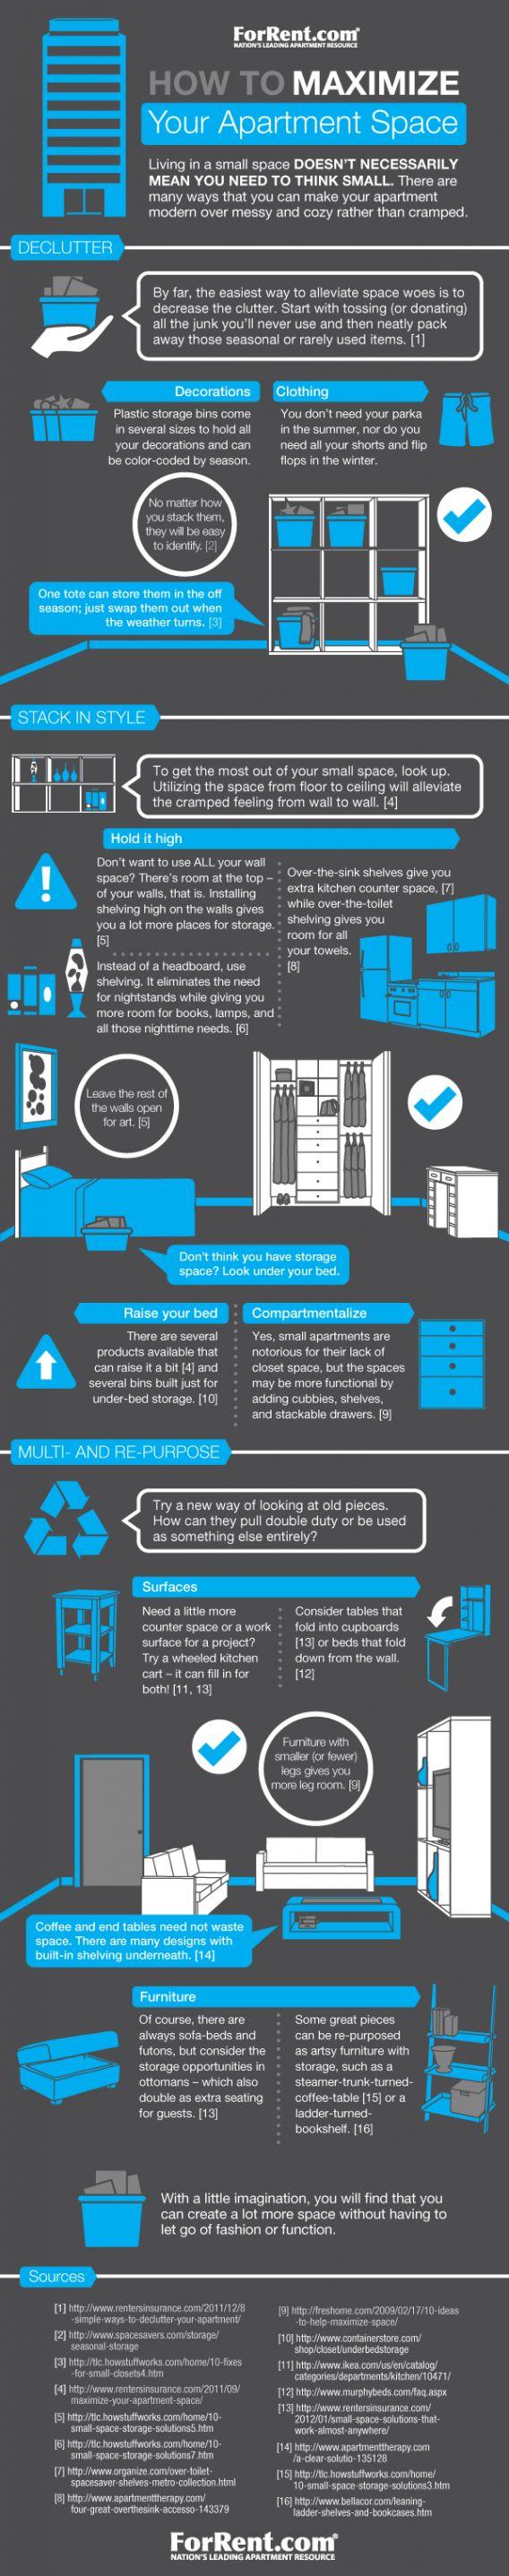 Best 20+ Small apartment organization ideas on Pinterest